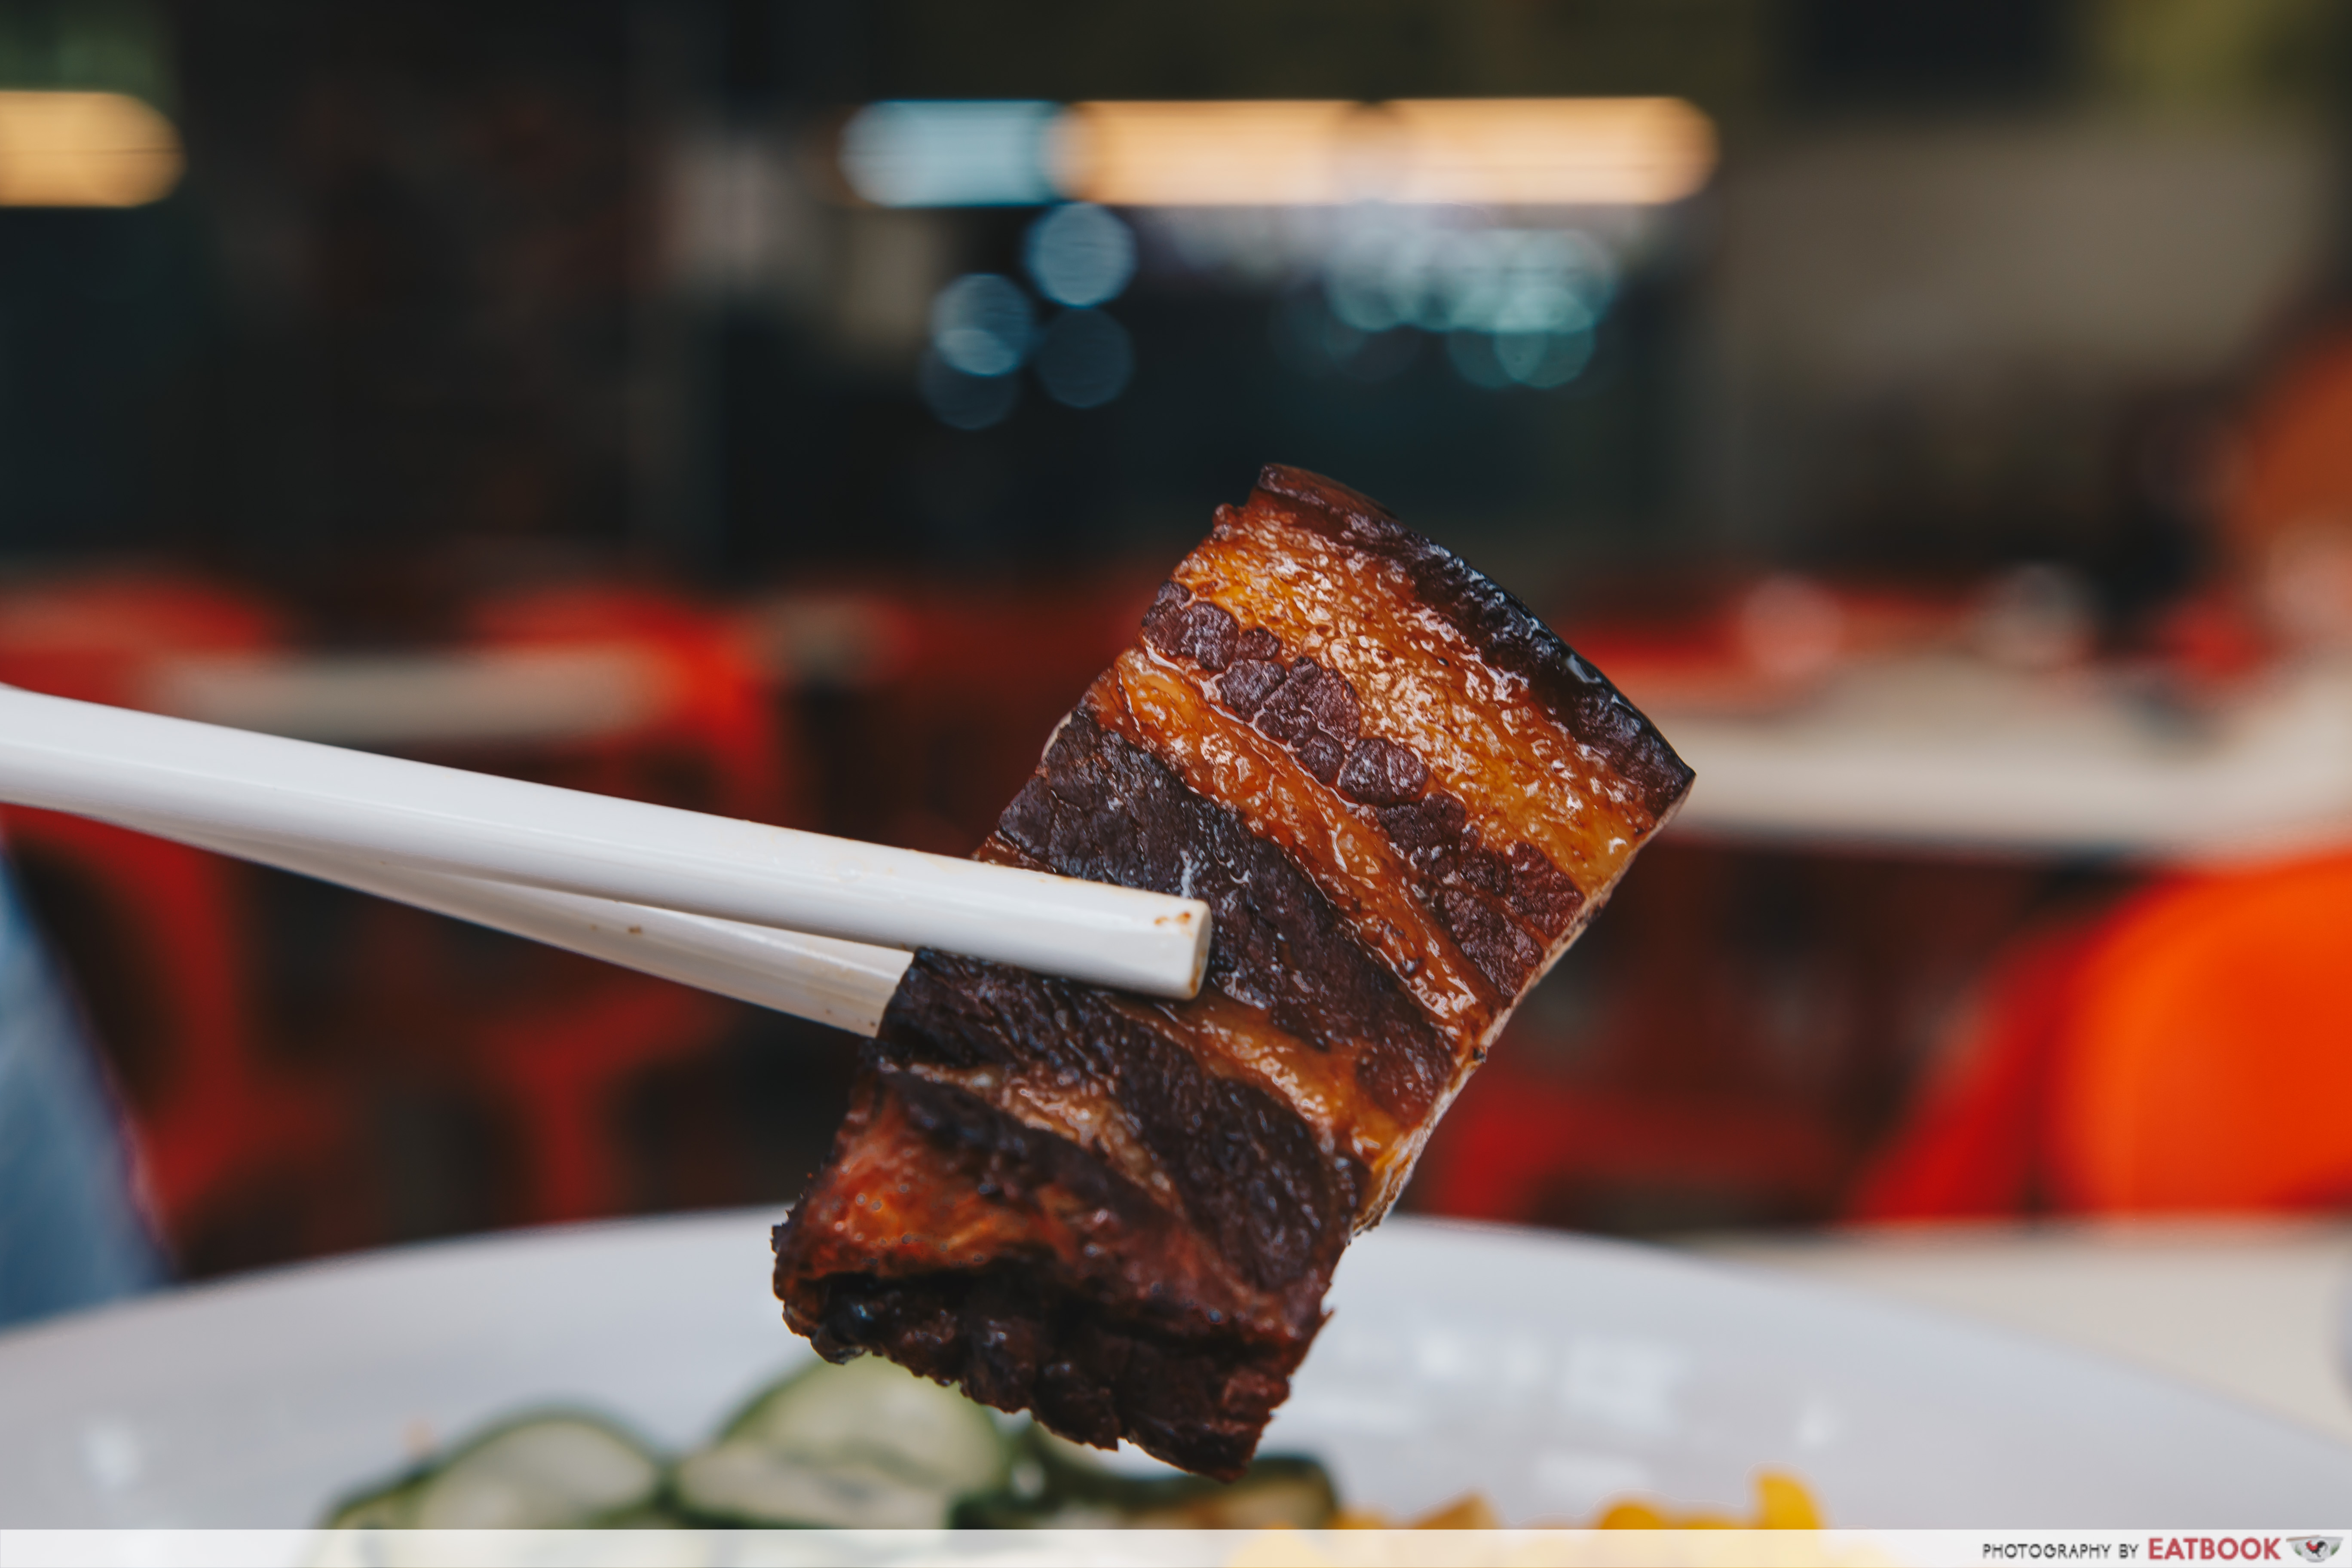 Sing HK Cafe - Braised Pork Close Up